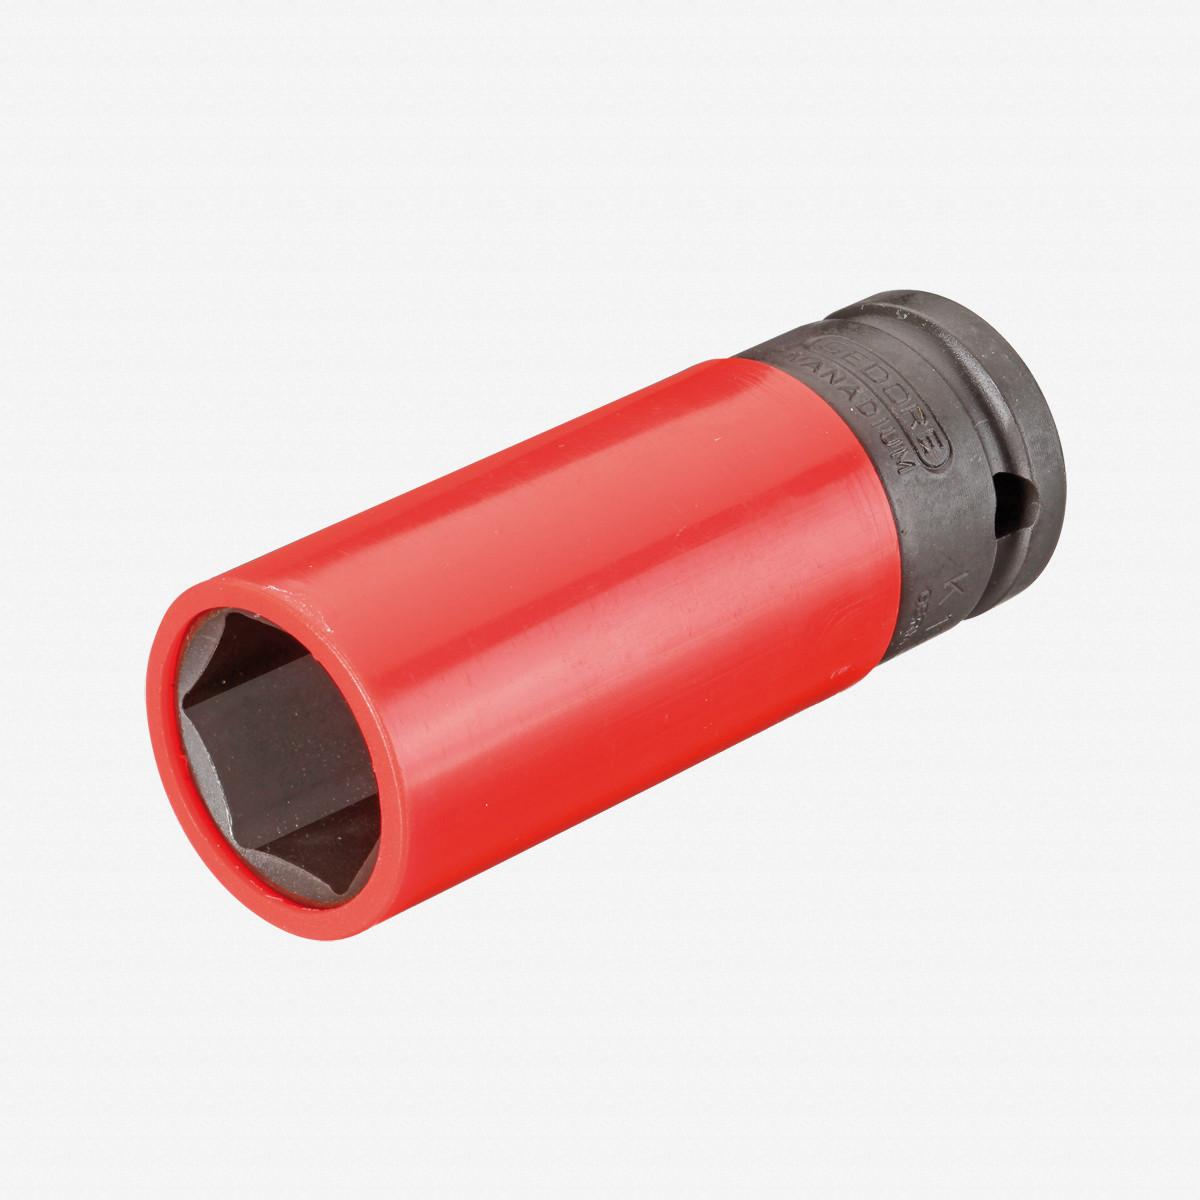 GEDORE K 19 22 Impact Socket 1//2 hex 22 mm